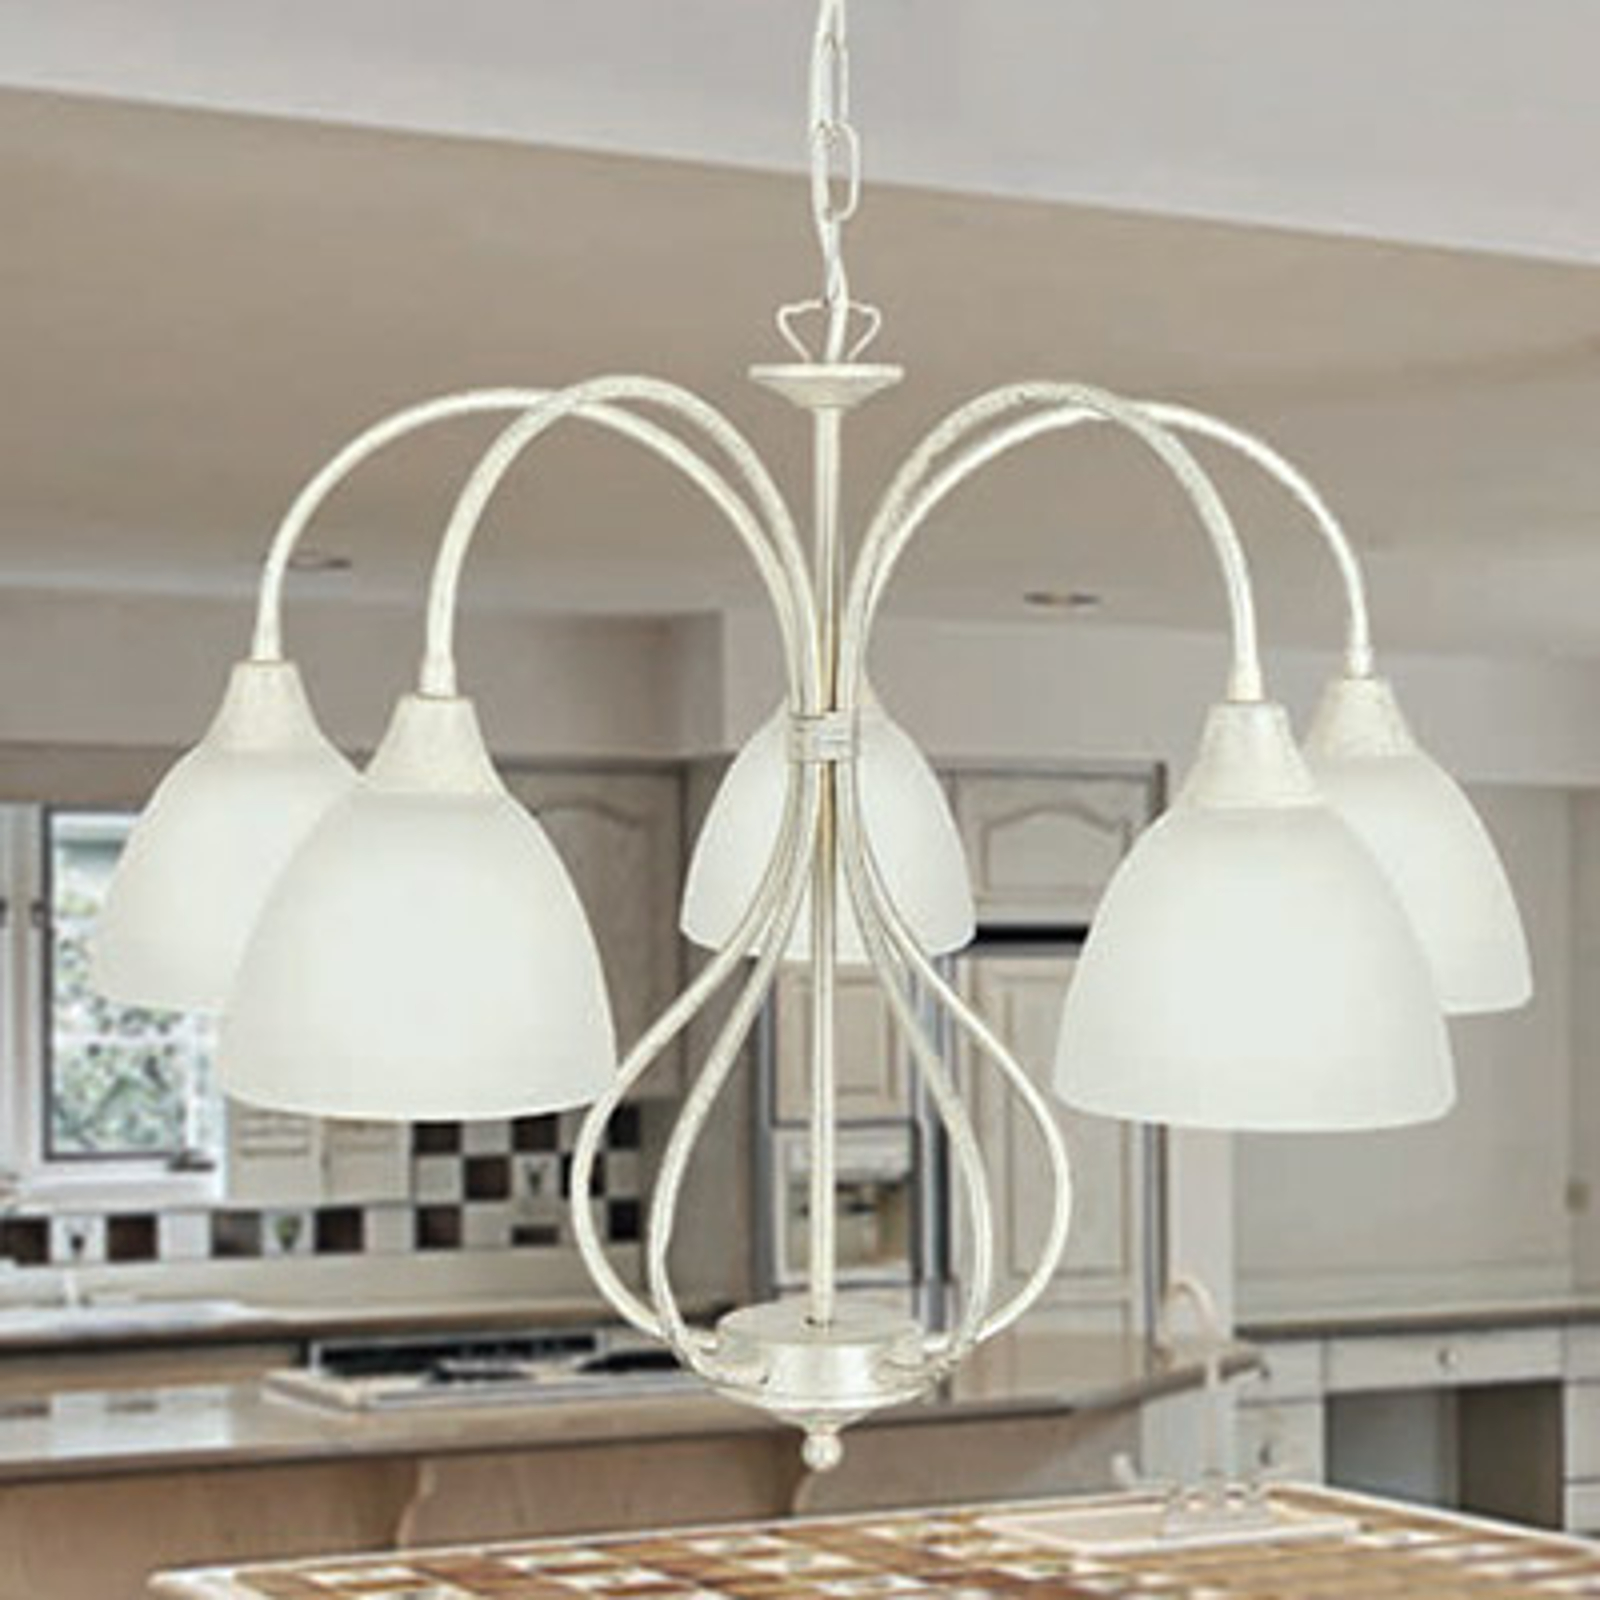 Gebogen hanglamp Antonella 5 lichtbronnen